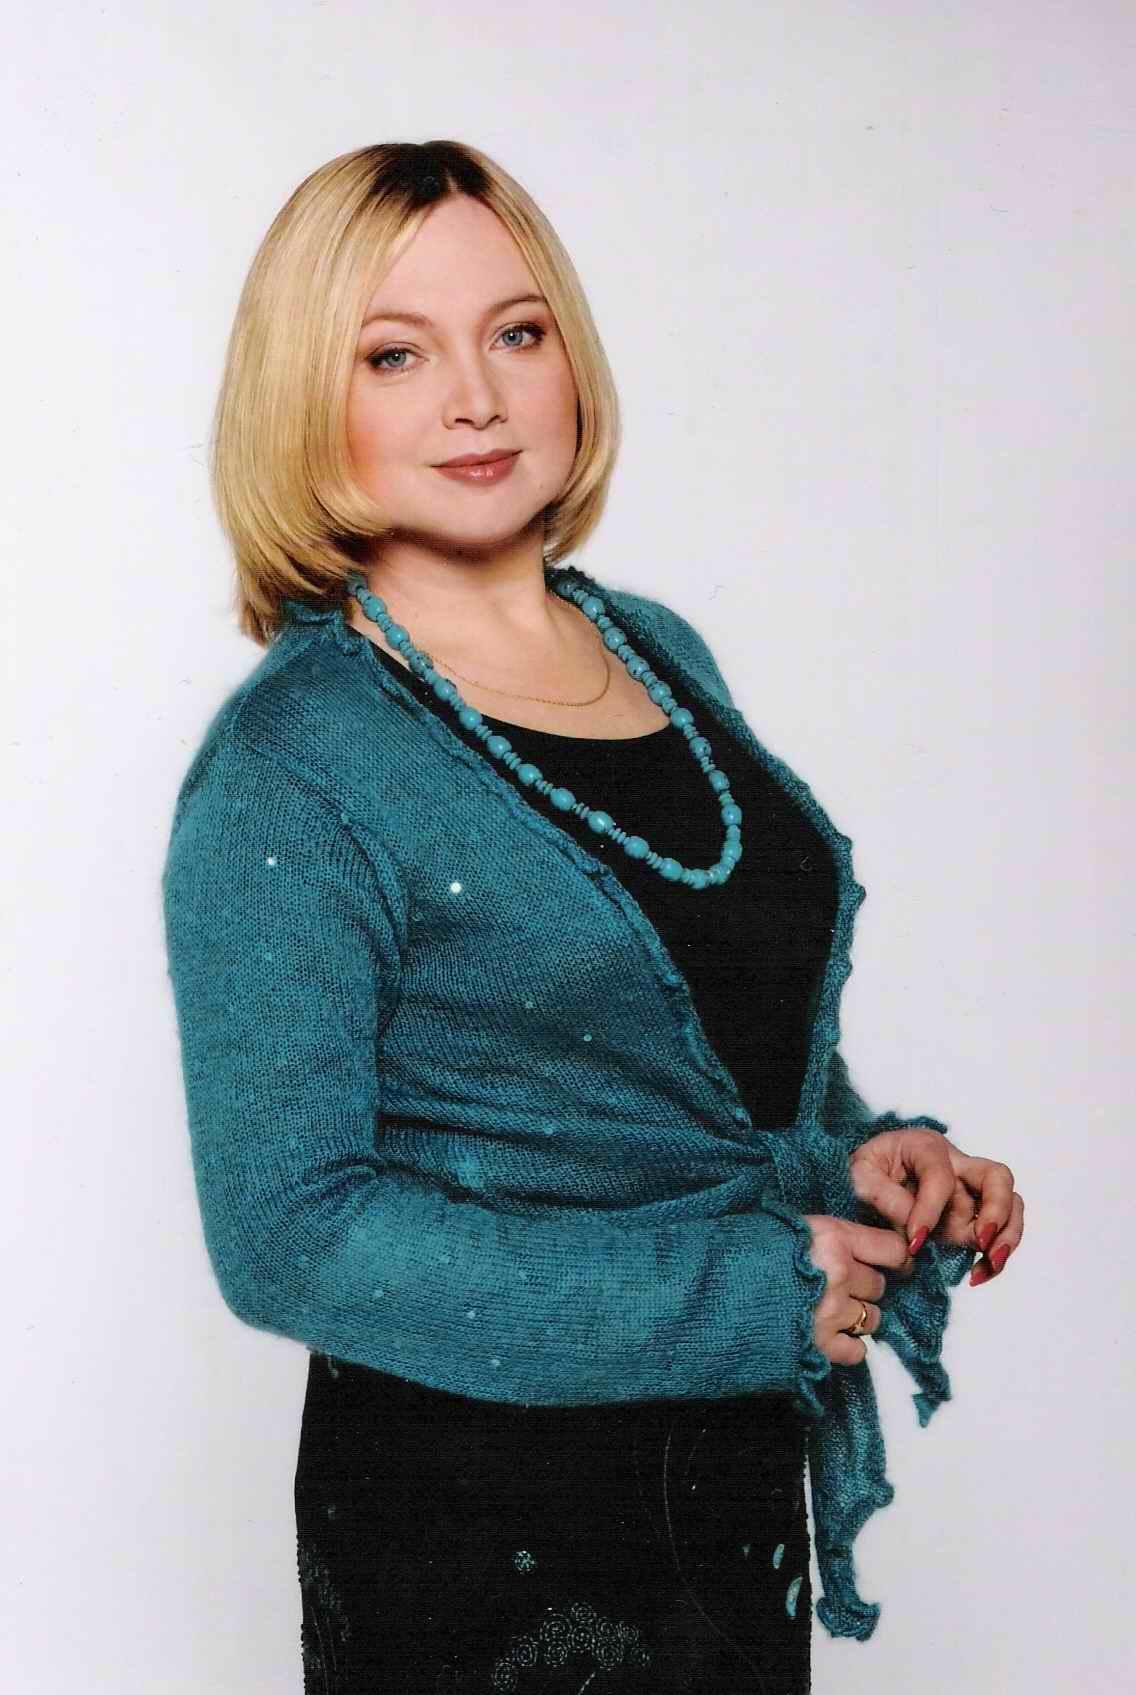 Фото российских актрис с фото 16 фотография